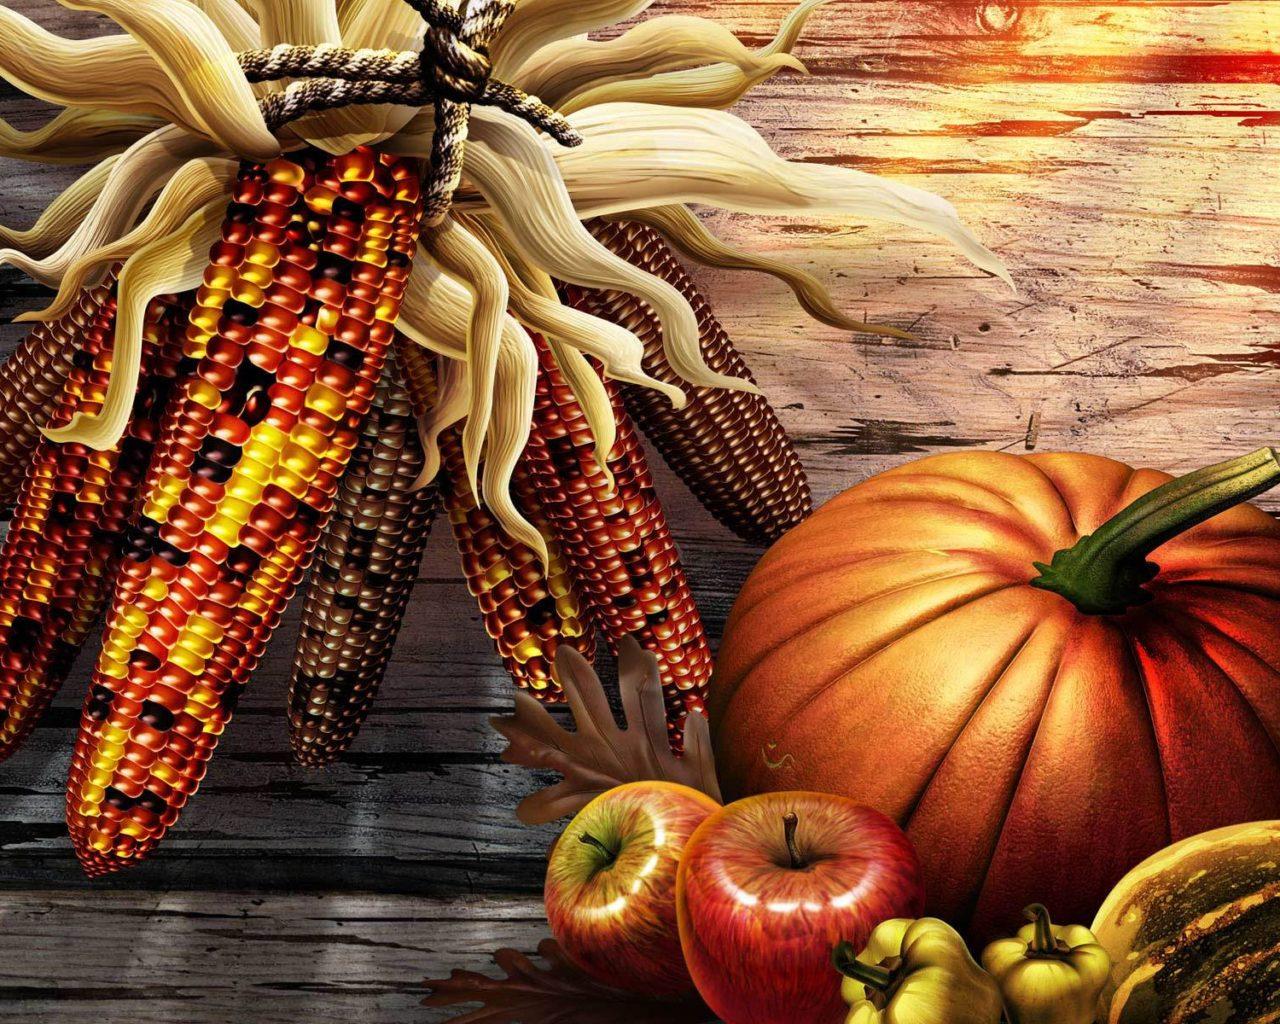 Animated Desktop Wallpaper Download Thanksgiving Holiday Wallpaper 1920x1200 3581